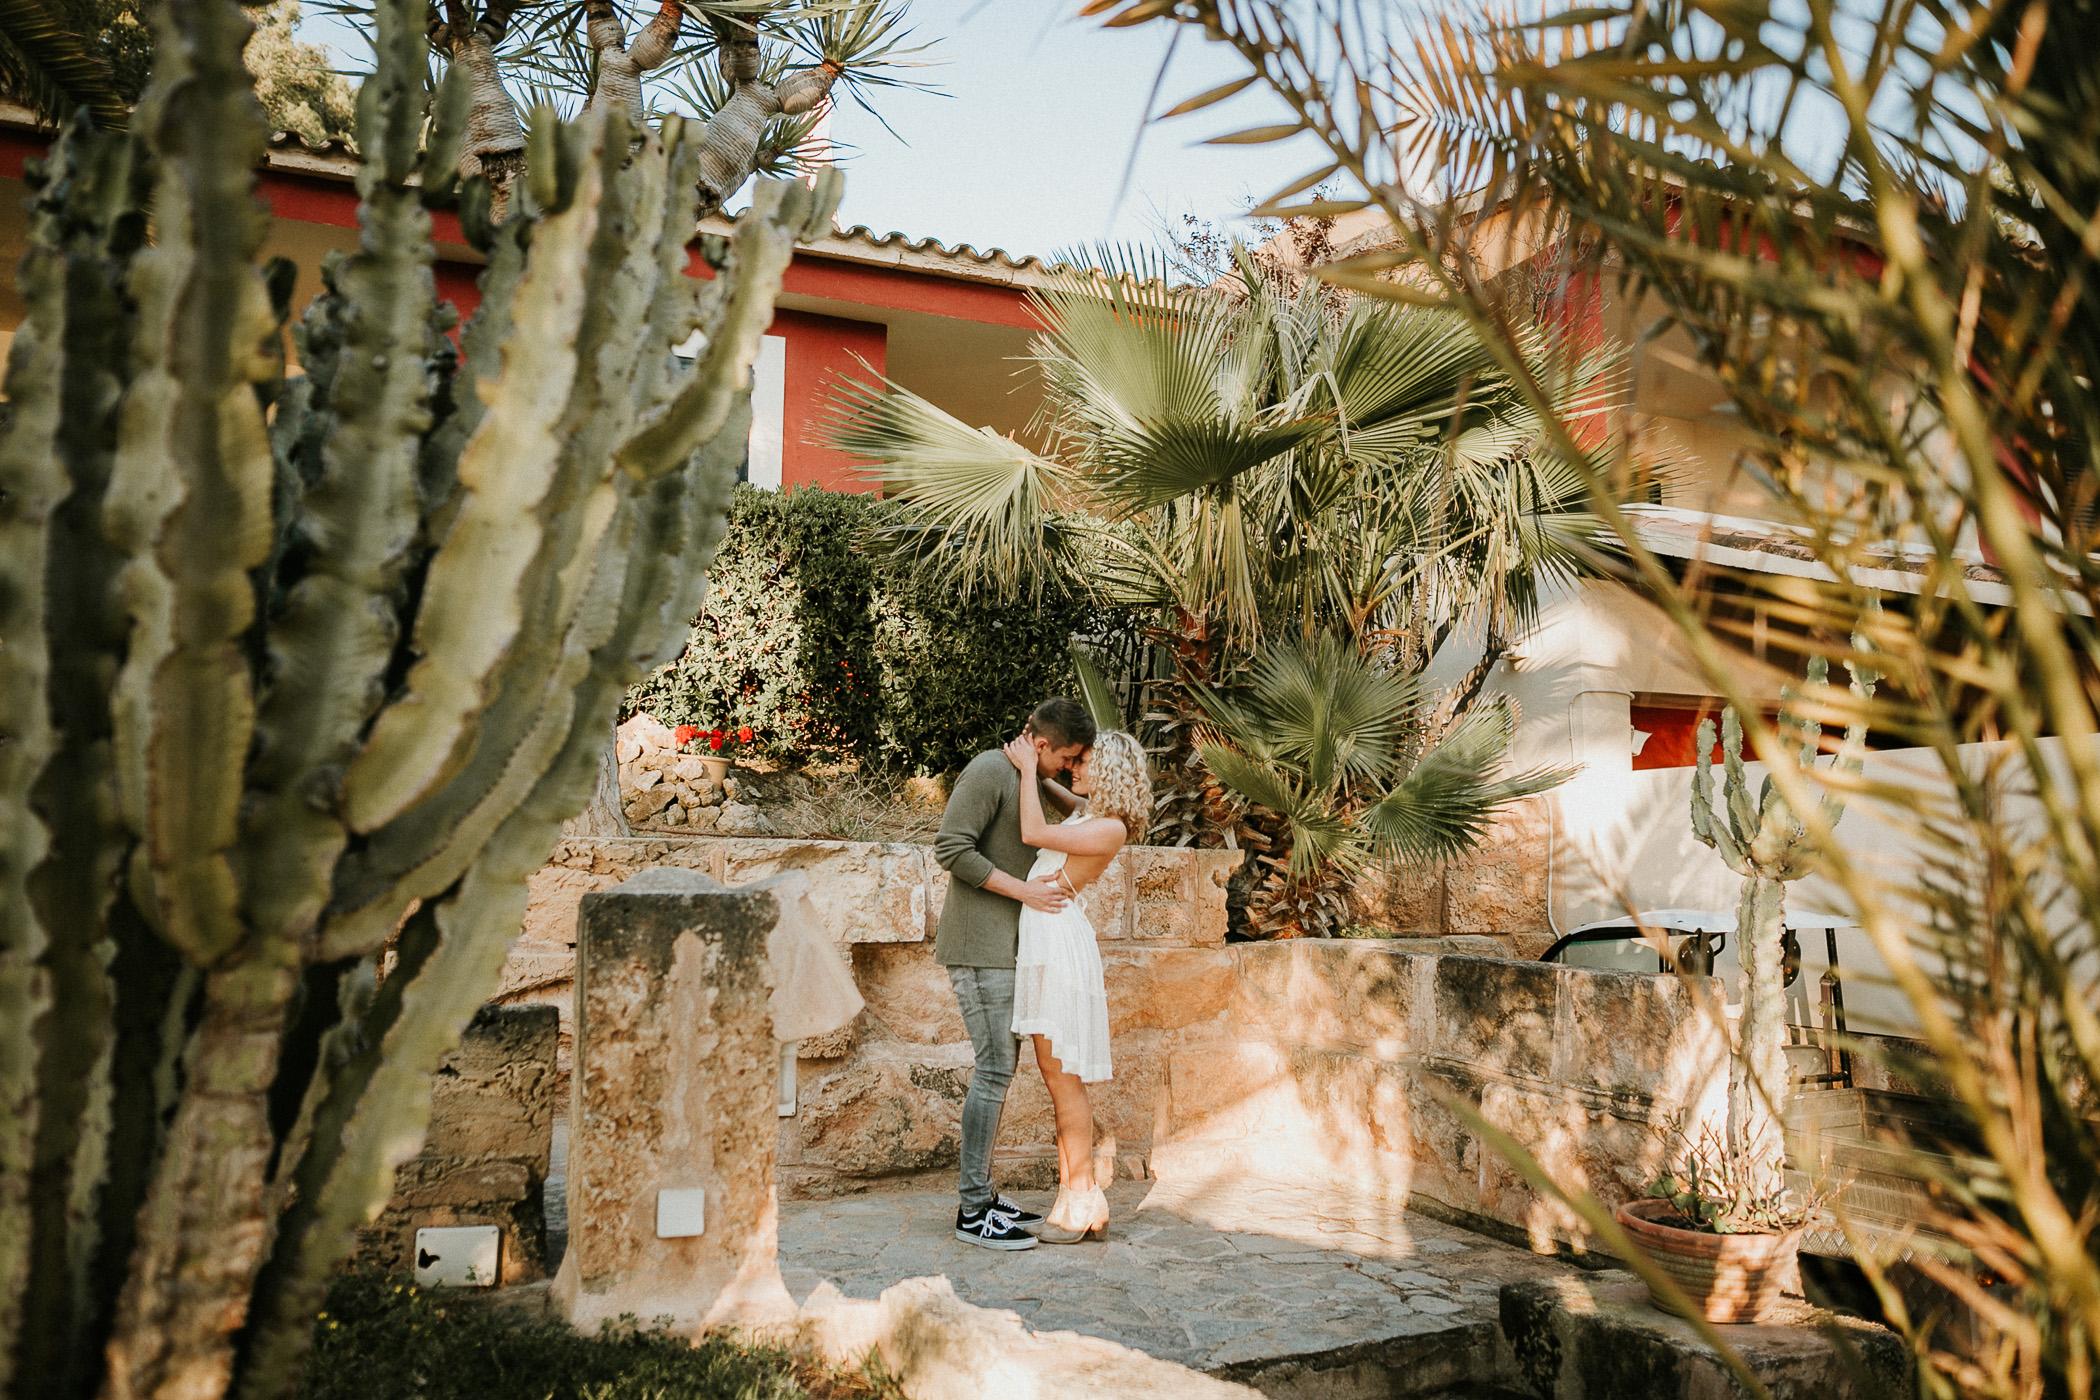 DanielaMarquardtPhotography_elopement_mallorca_spain_paguera_palma_charlyandbela_62